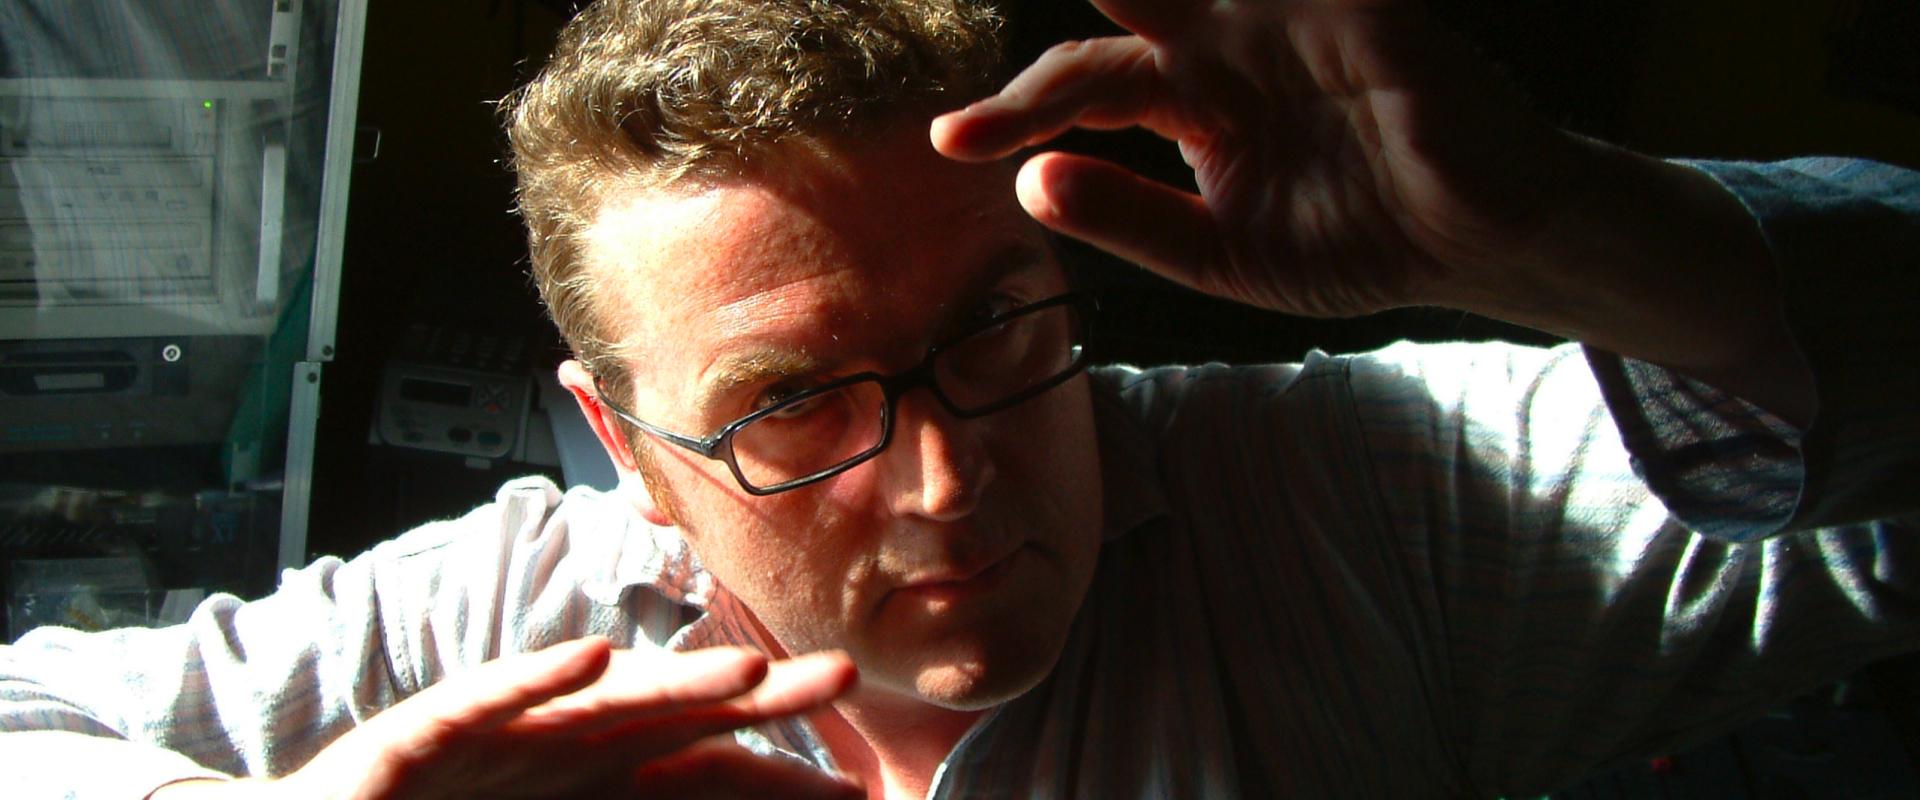 Jim Sutherland - Composer